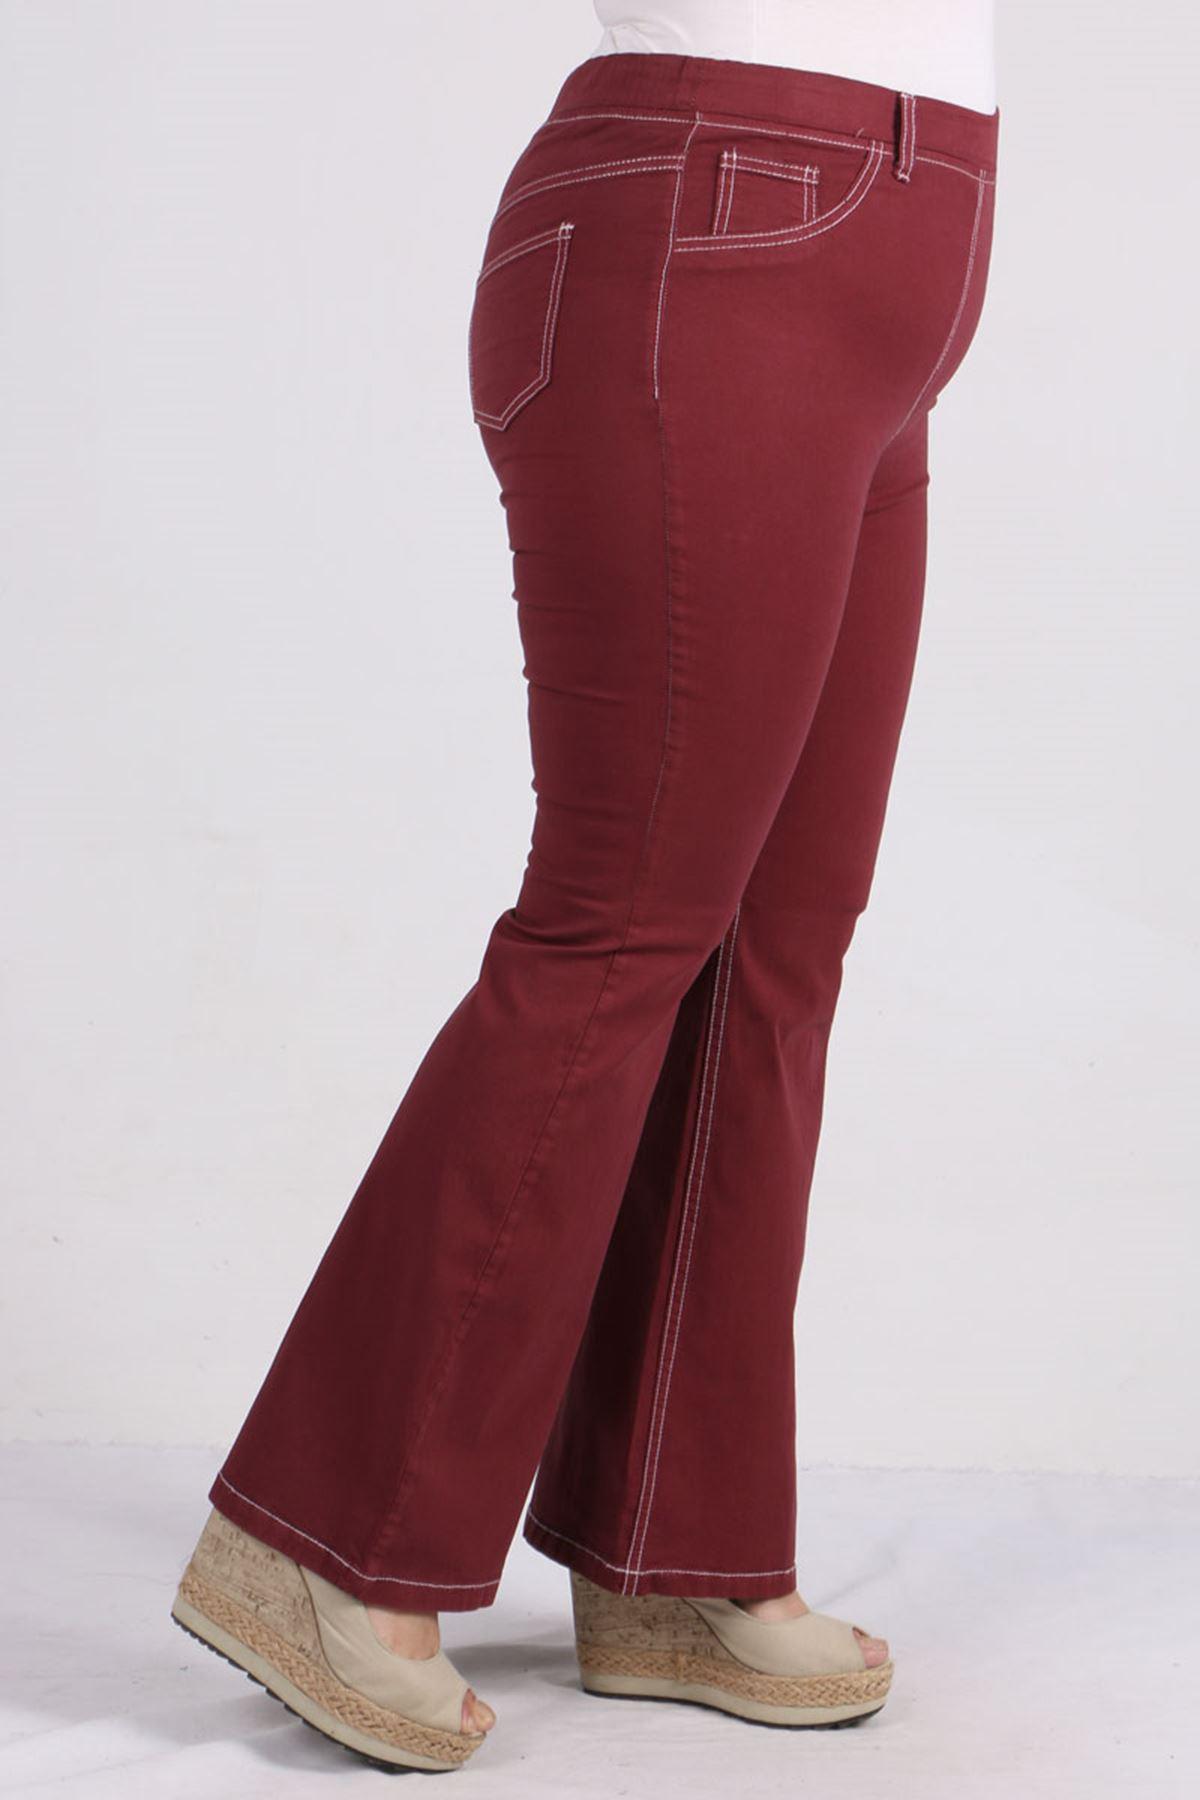 9143 Plus Size Elastic Waist Flared Pants-  Claret Red